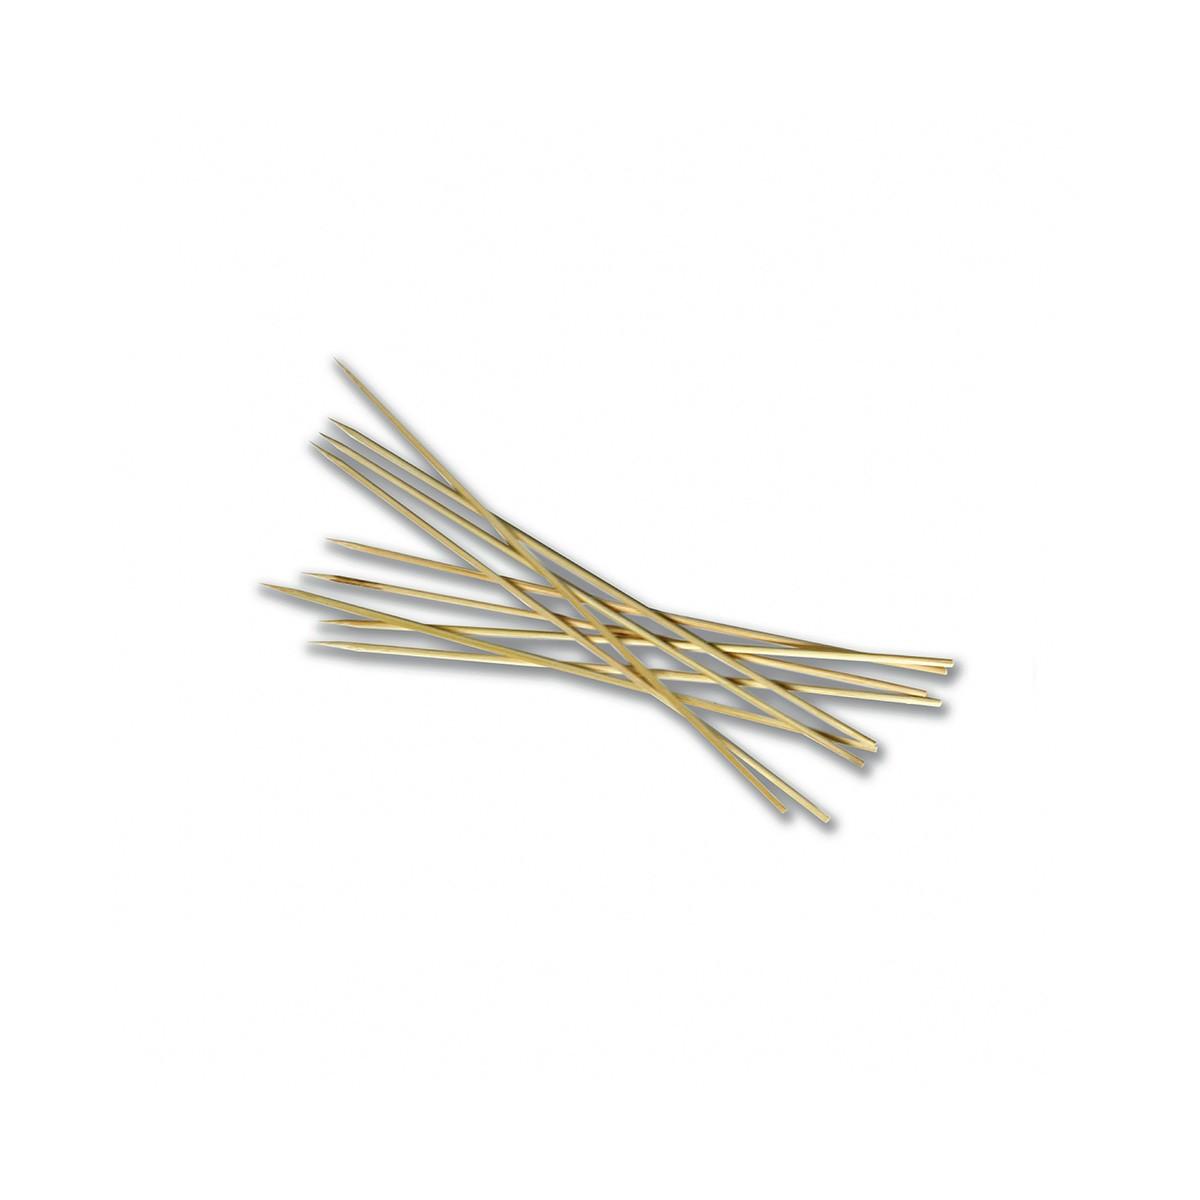 Bamboo Skewer 9cm | 200pcsx100pkts